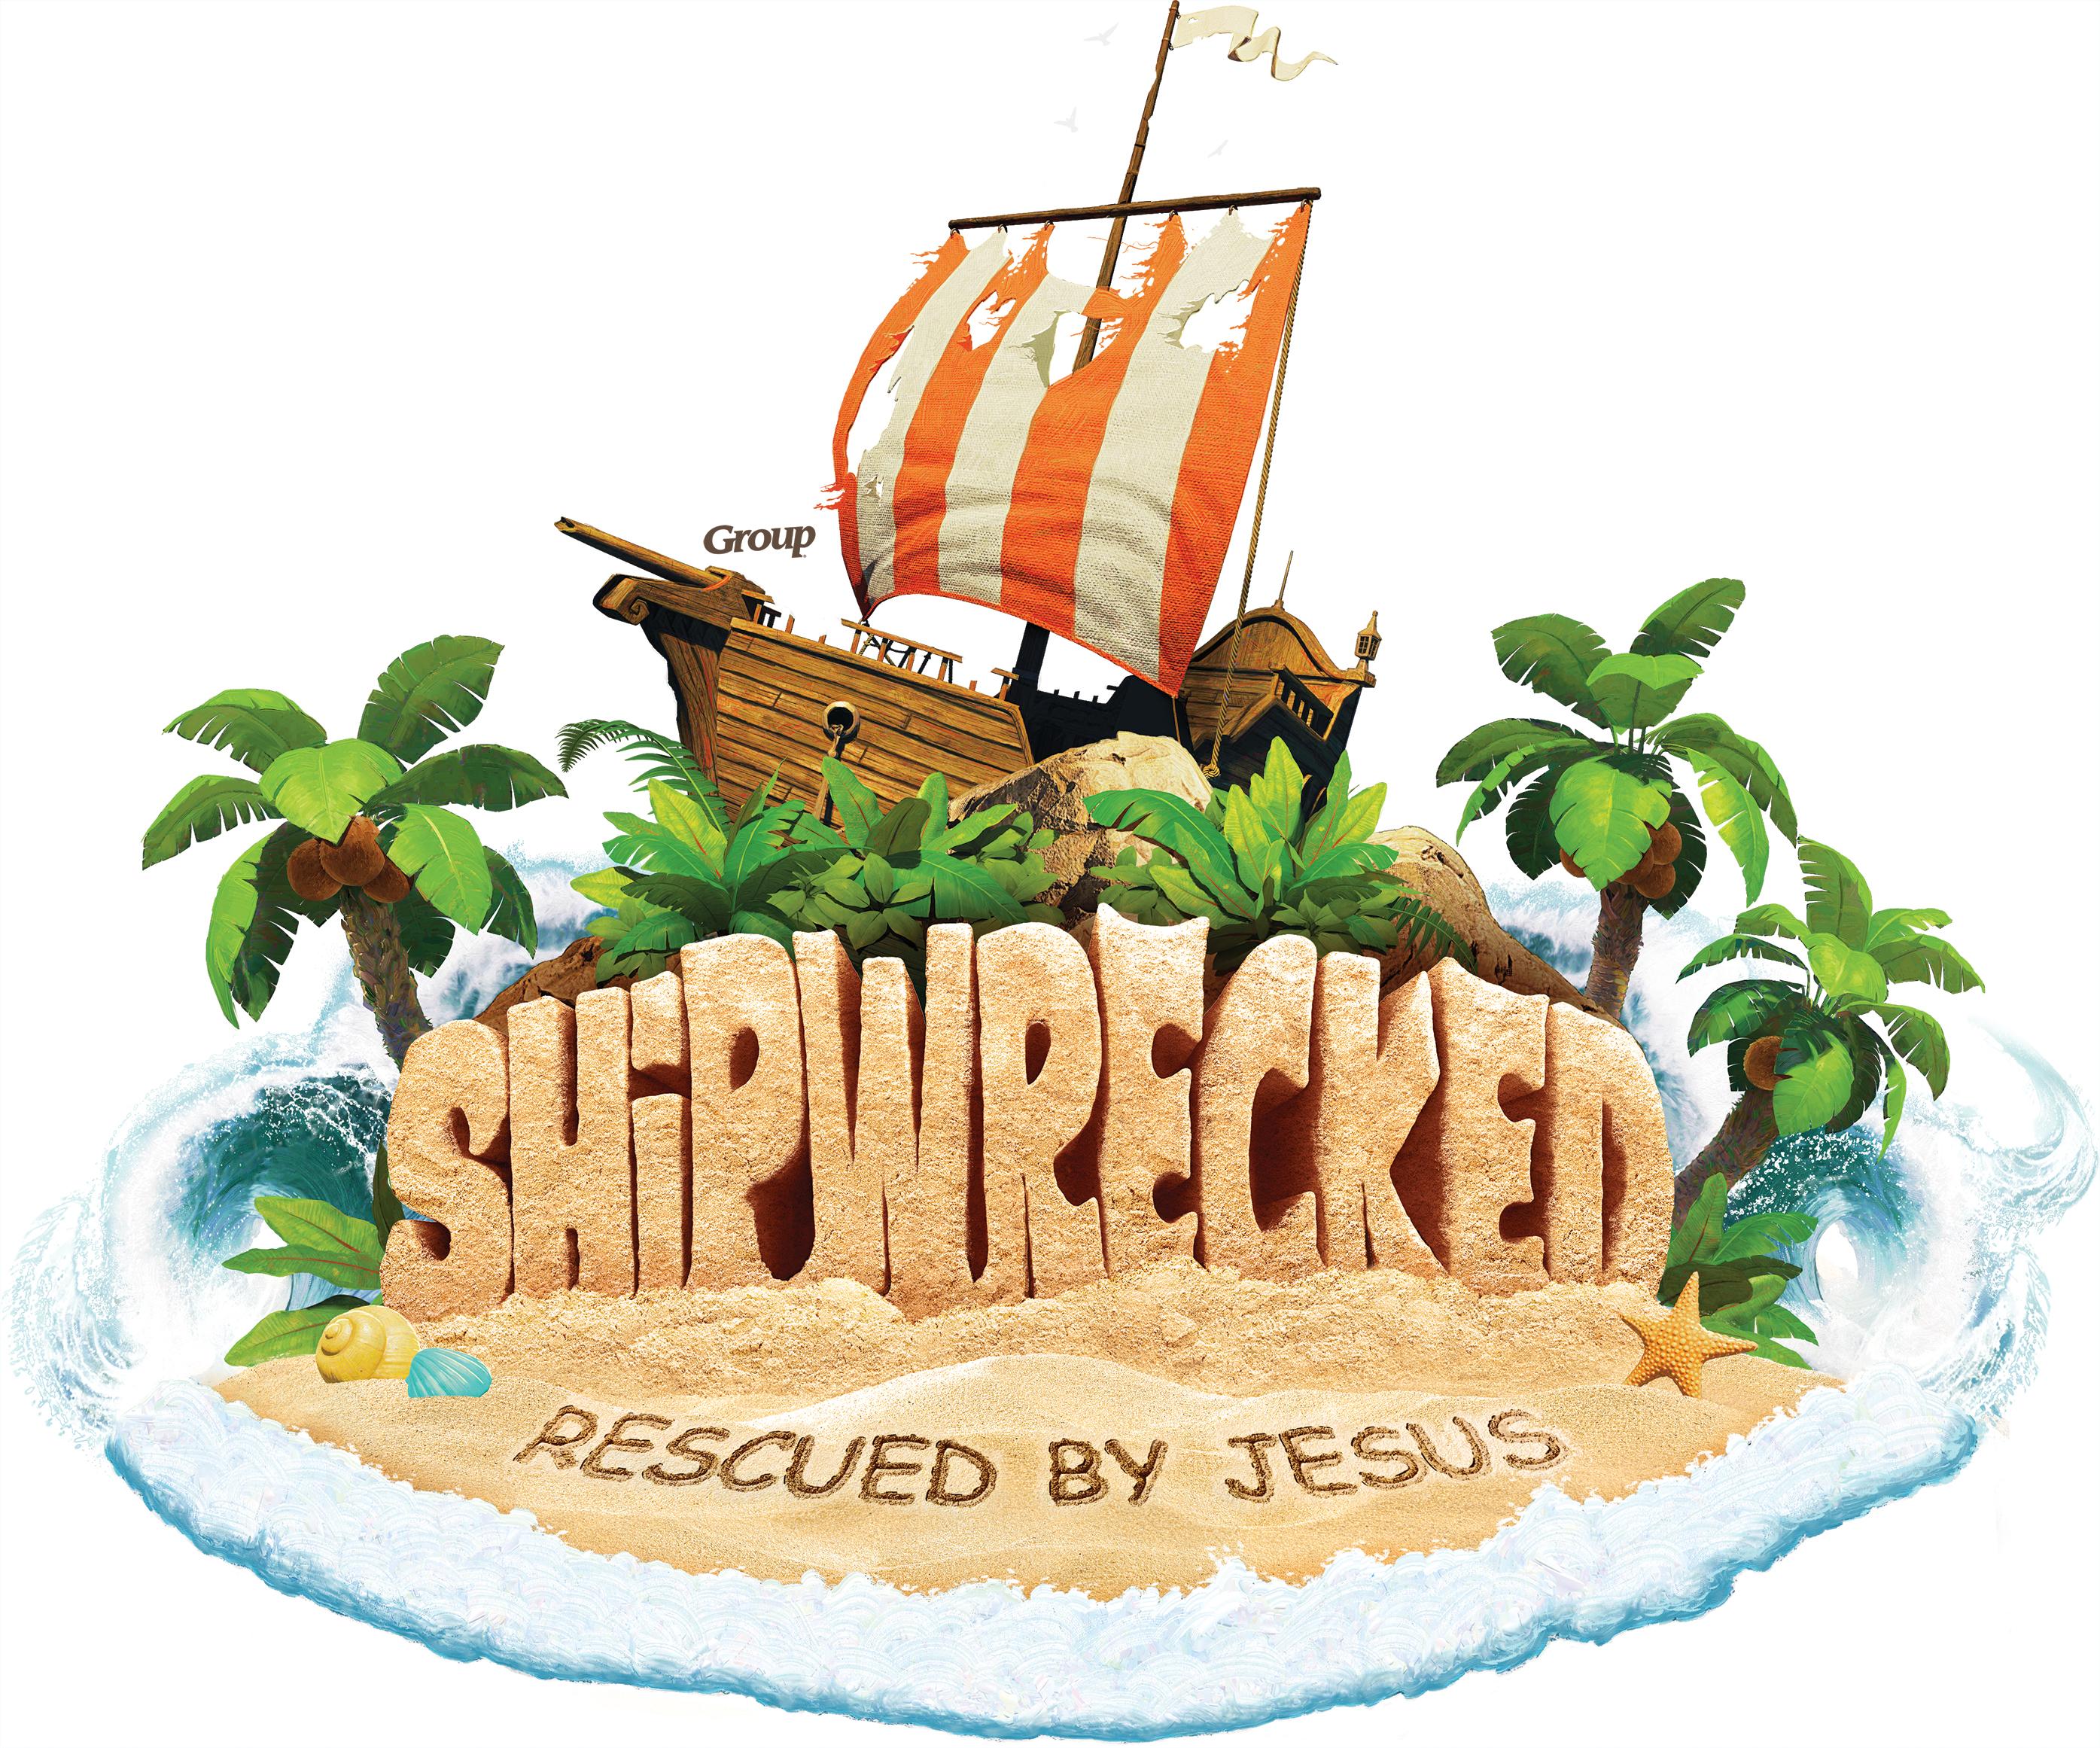 Shipwrecked vbs logo hires rgb